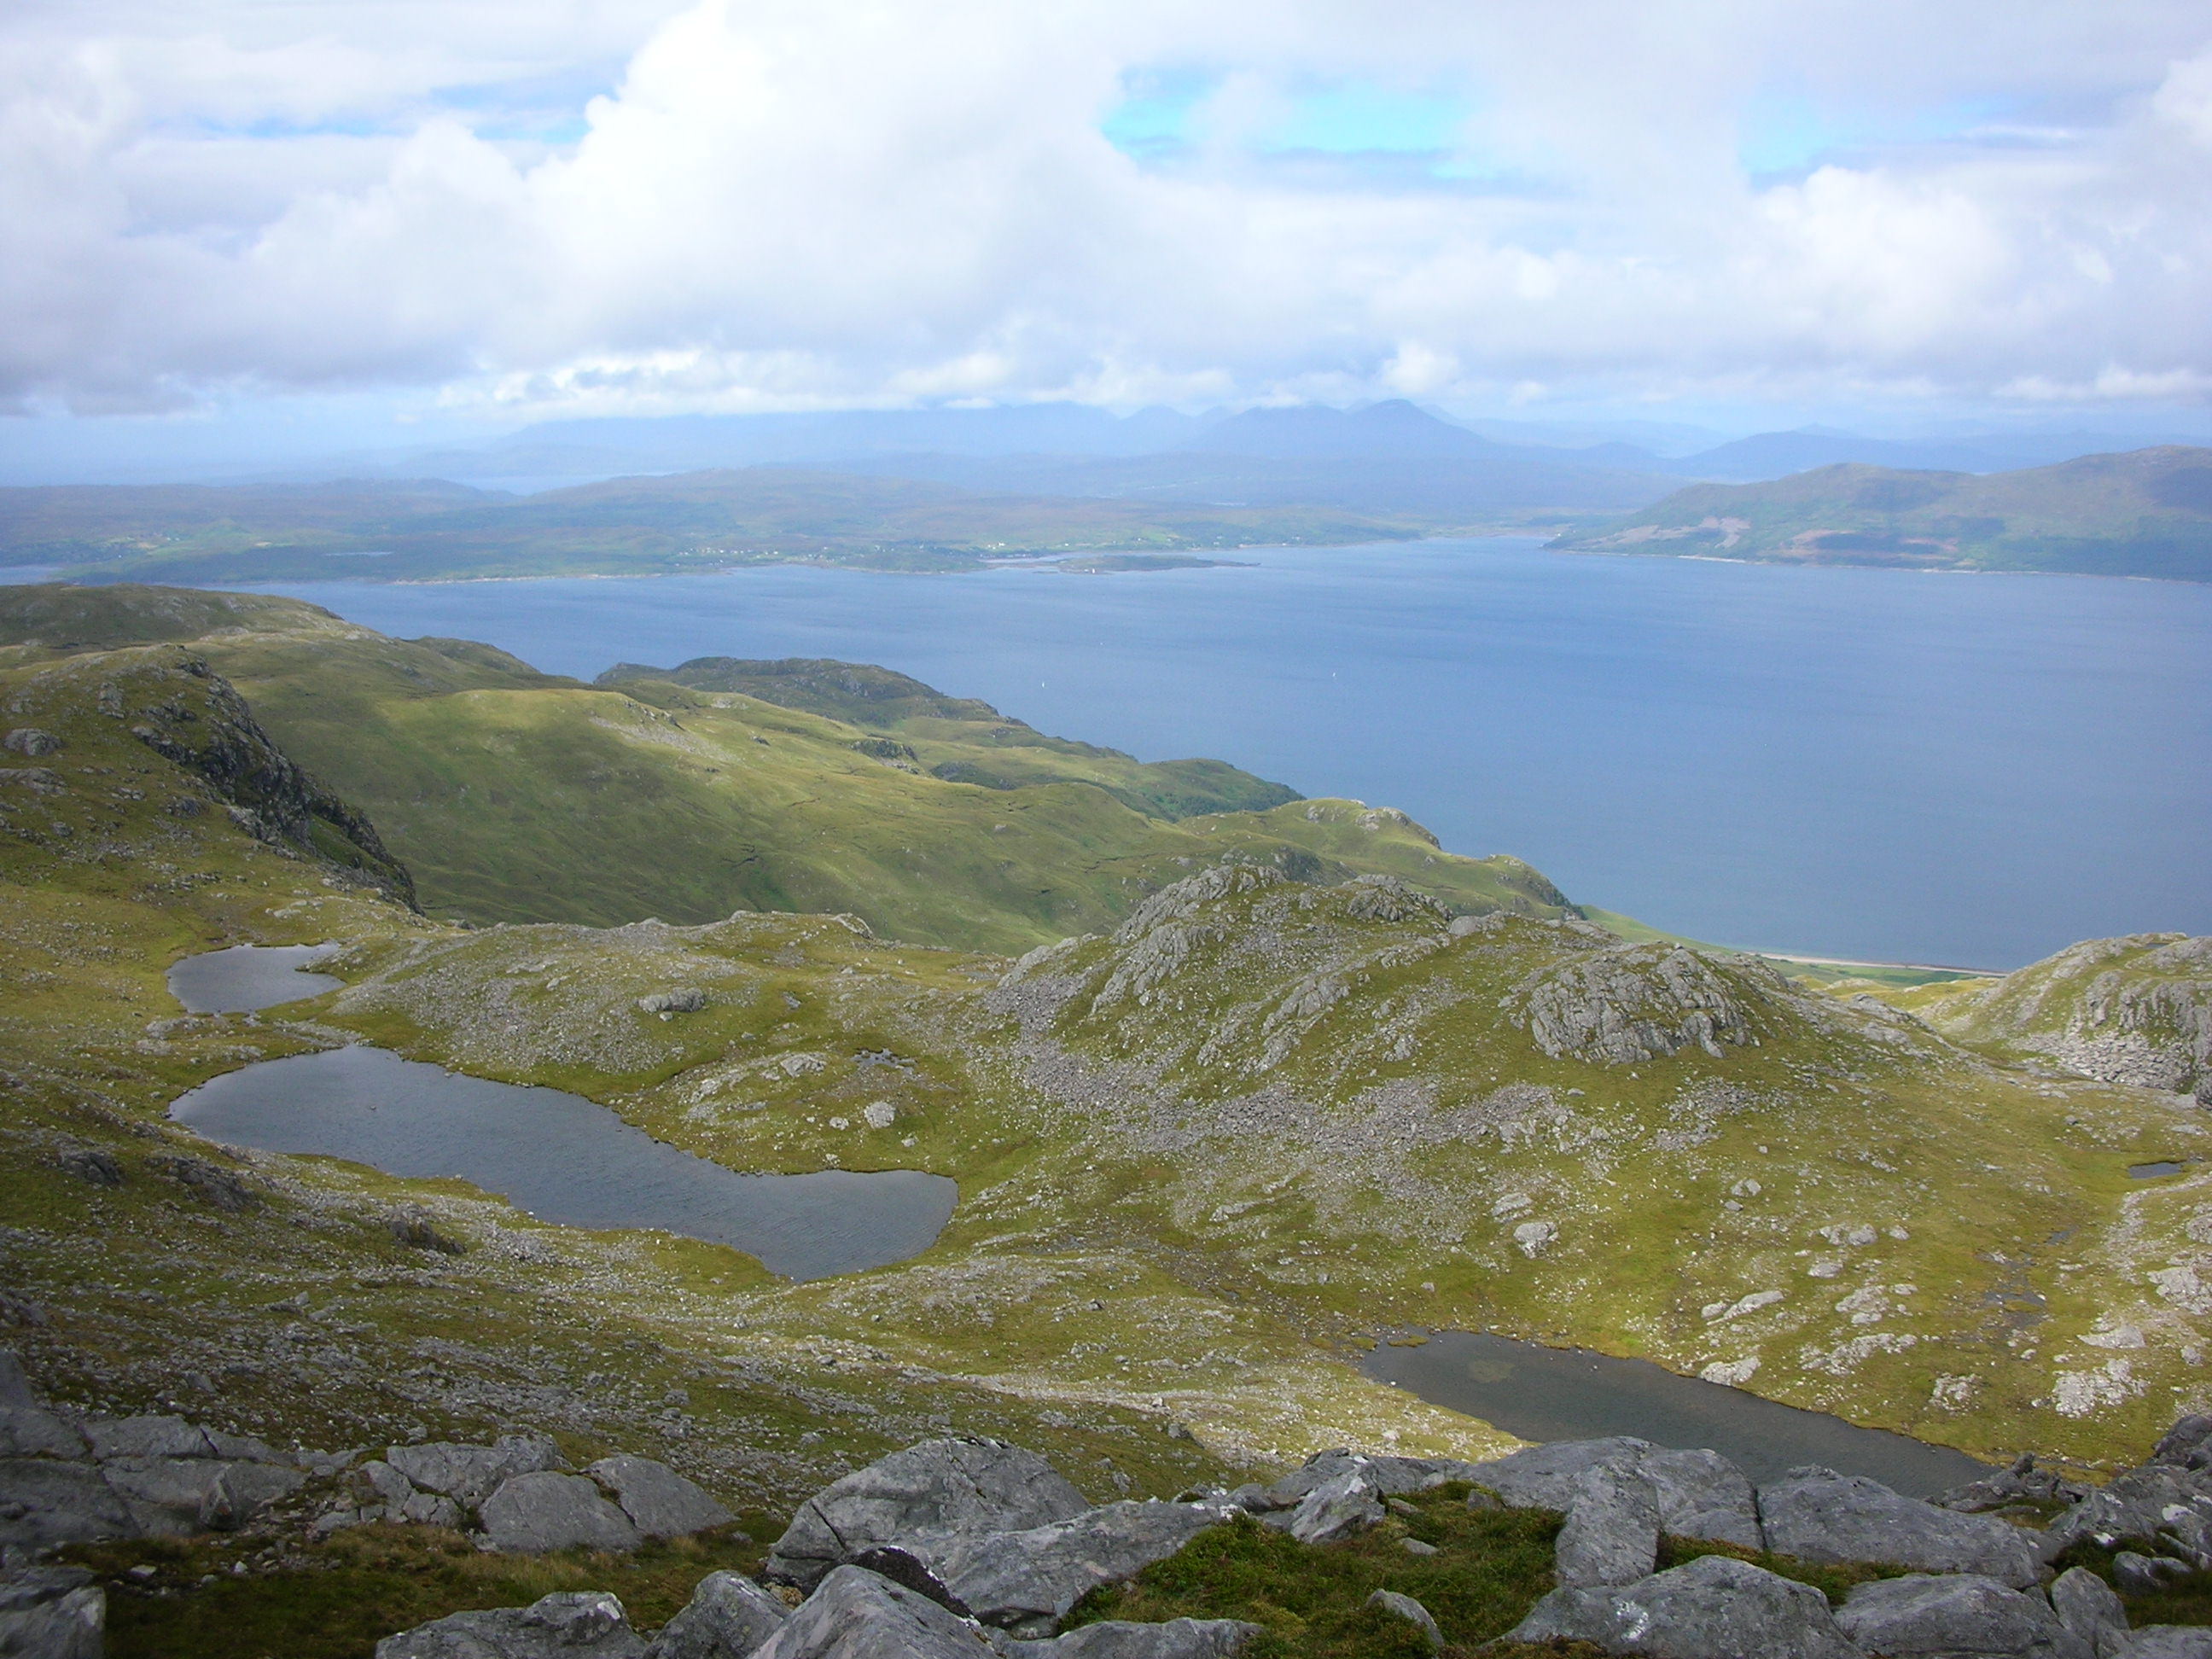 Skye from Bheinn na Caillich